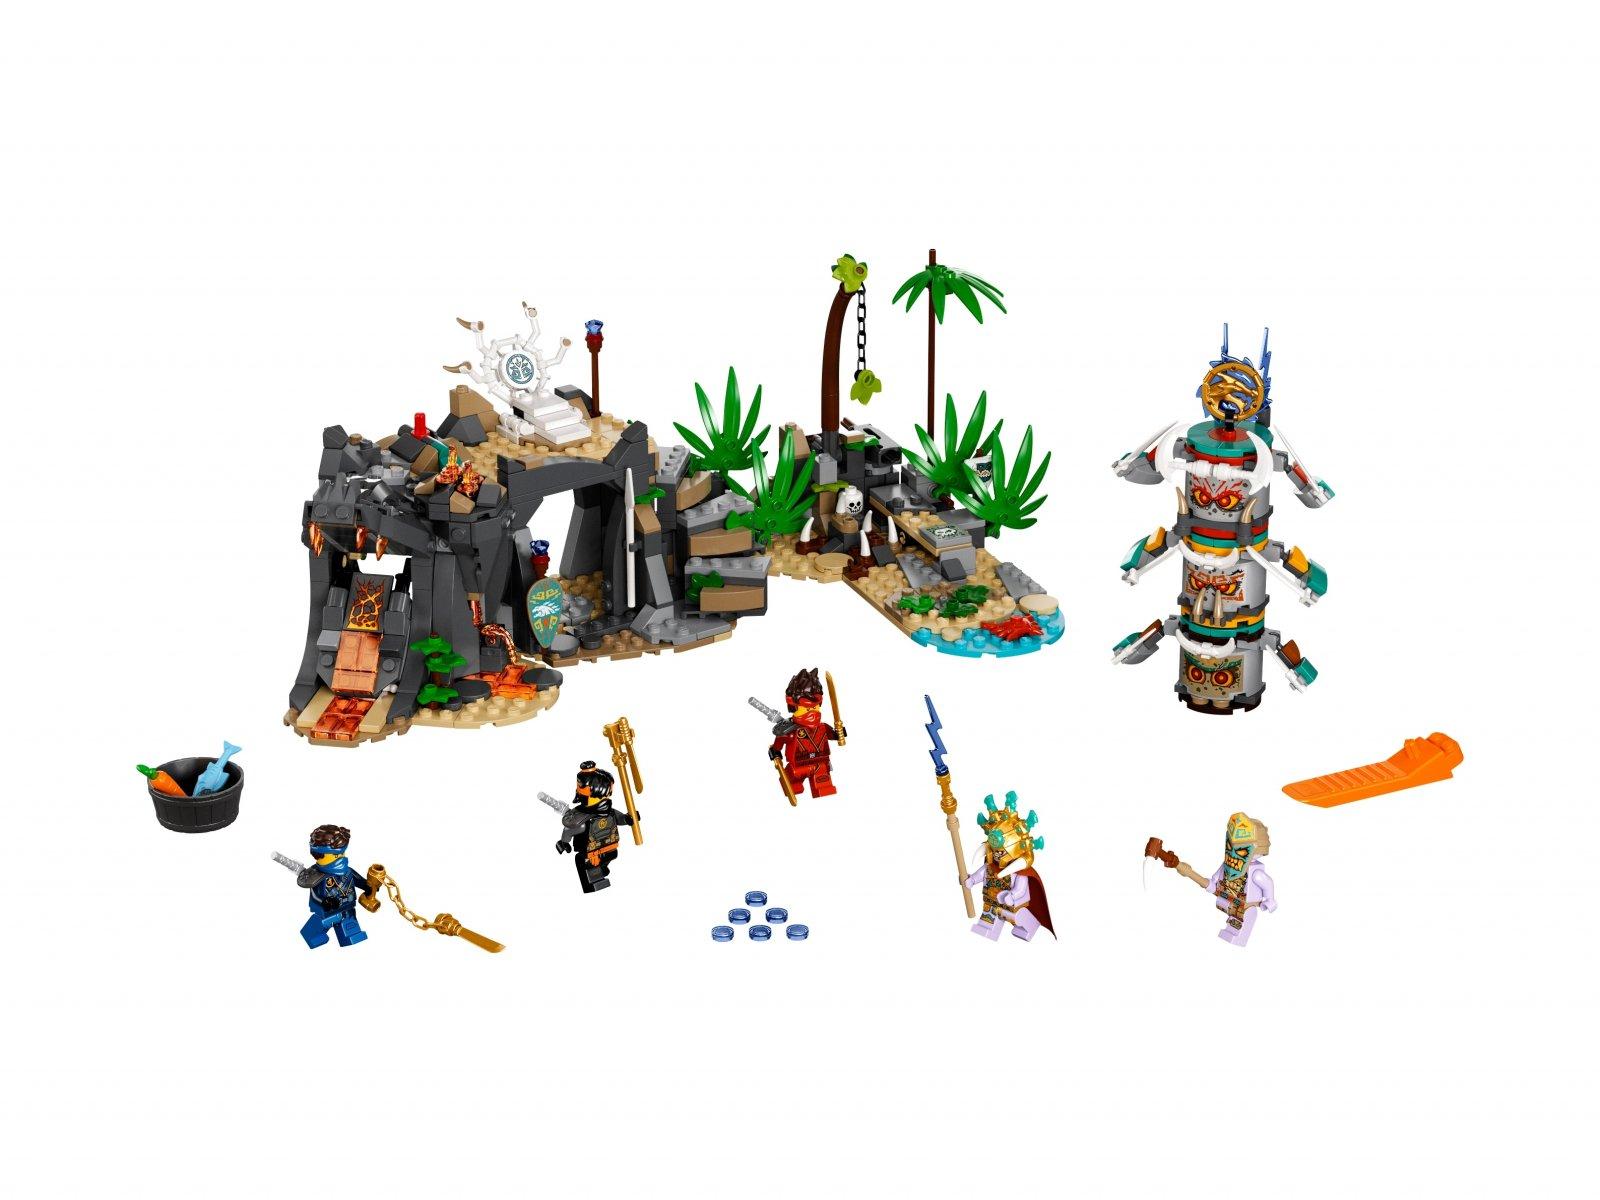 LEGO Ninjago 71747 Wioska strażników